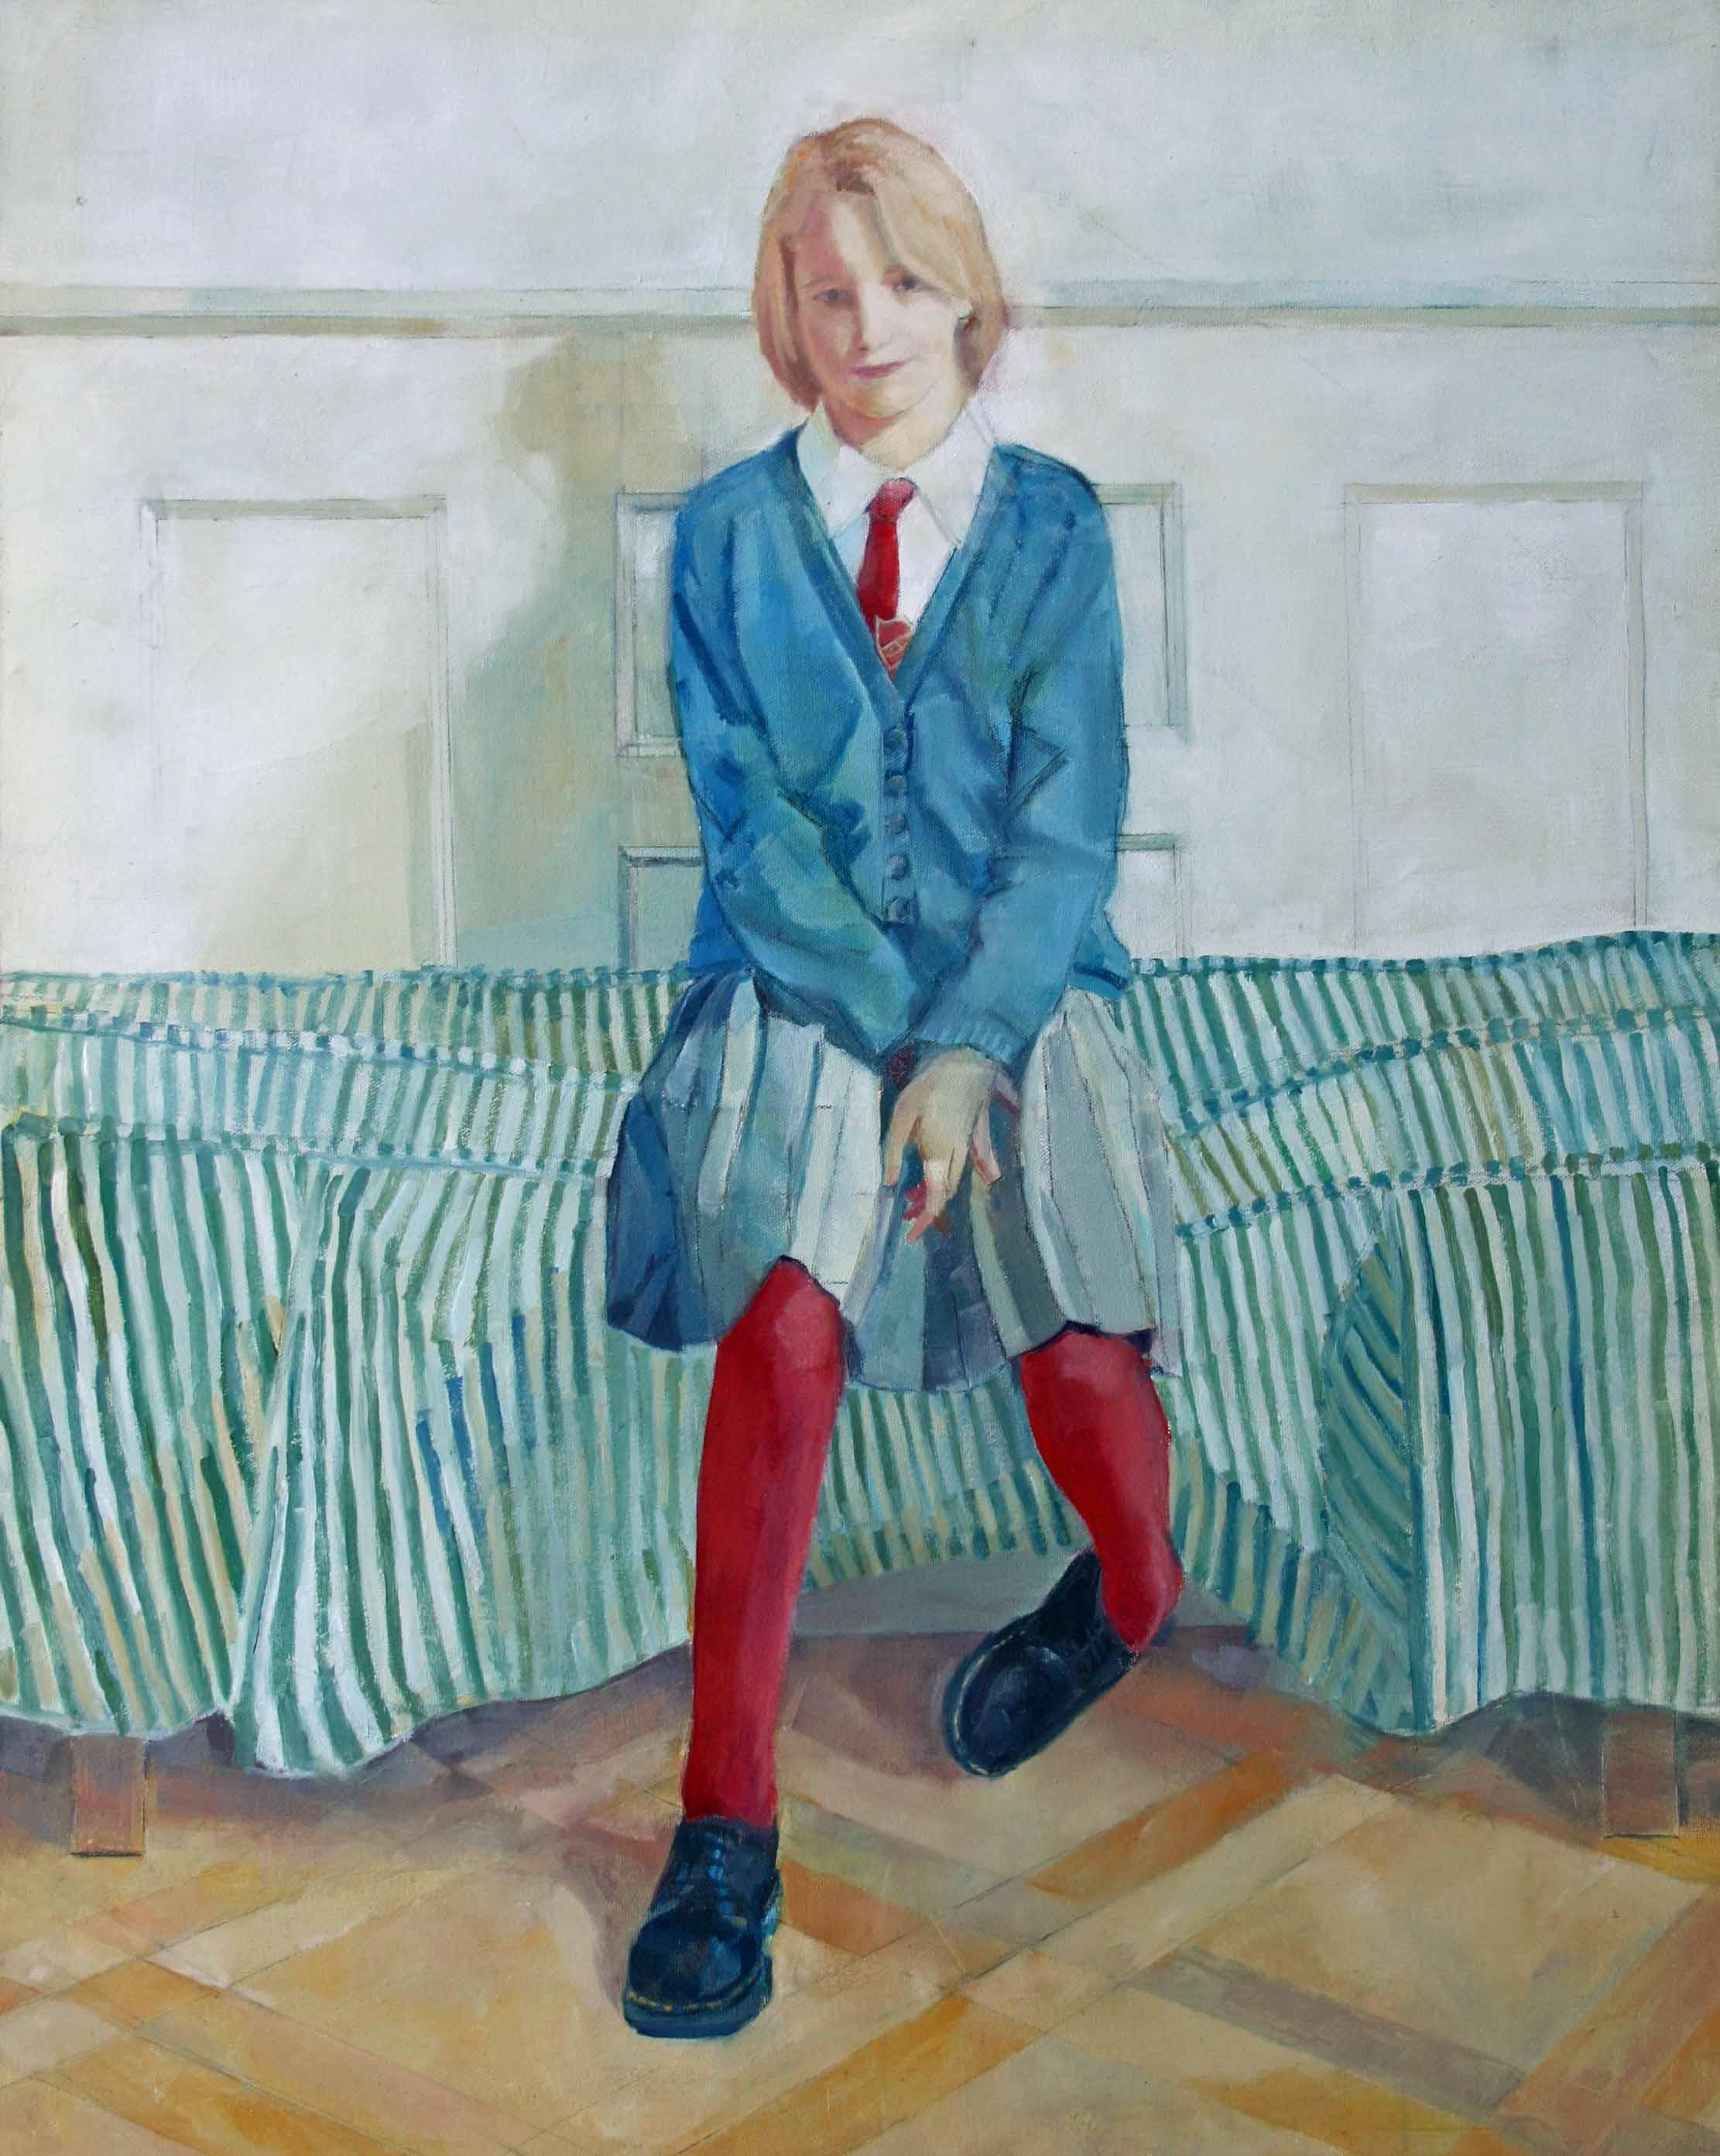 80 x 65 cm Harriet, Oil on Canvas